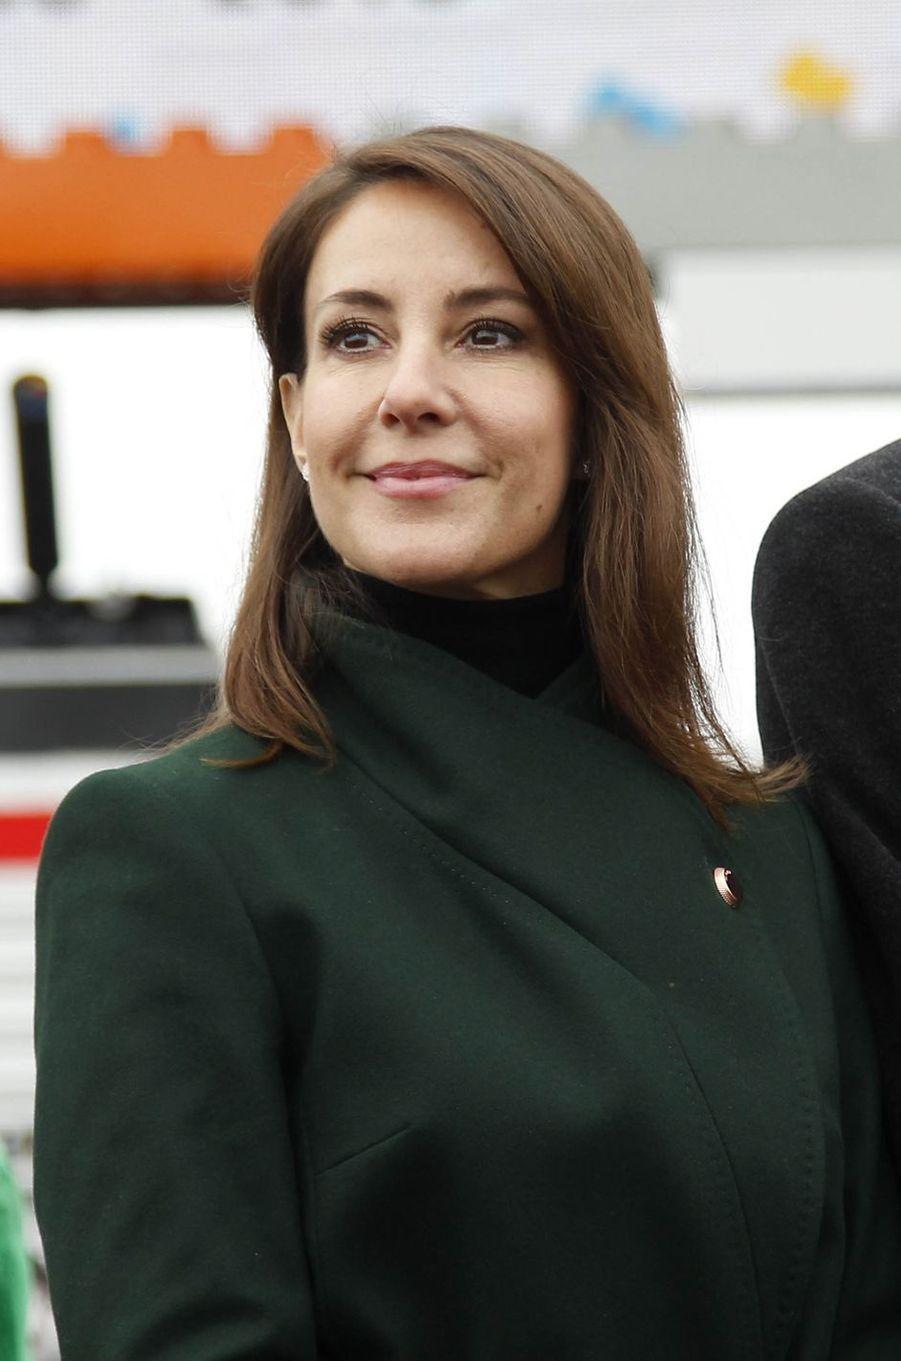 La princesse Marie de Danemark au Legoland Billund, le 24 mars 2018